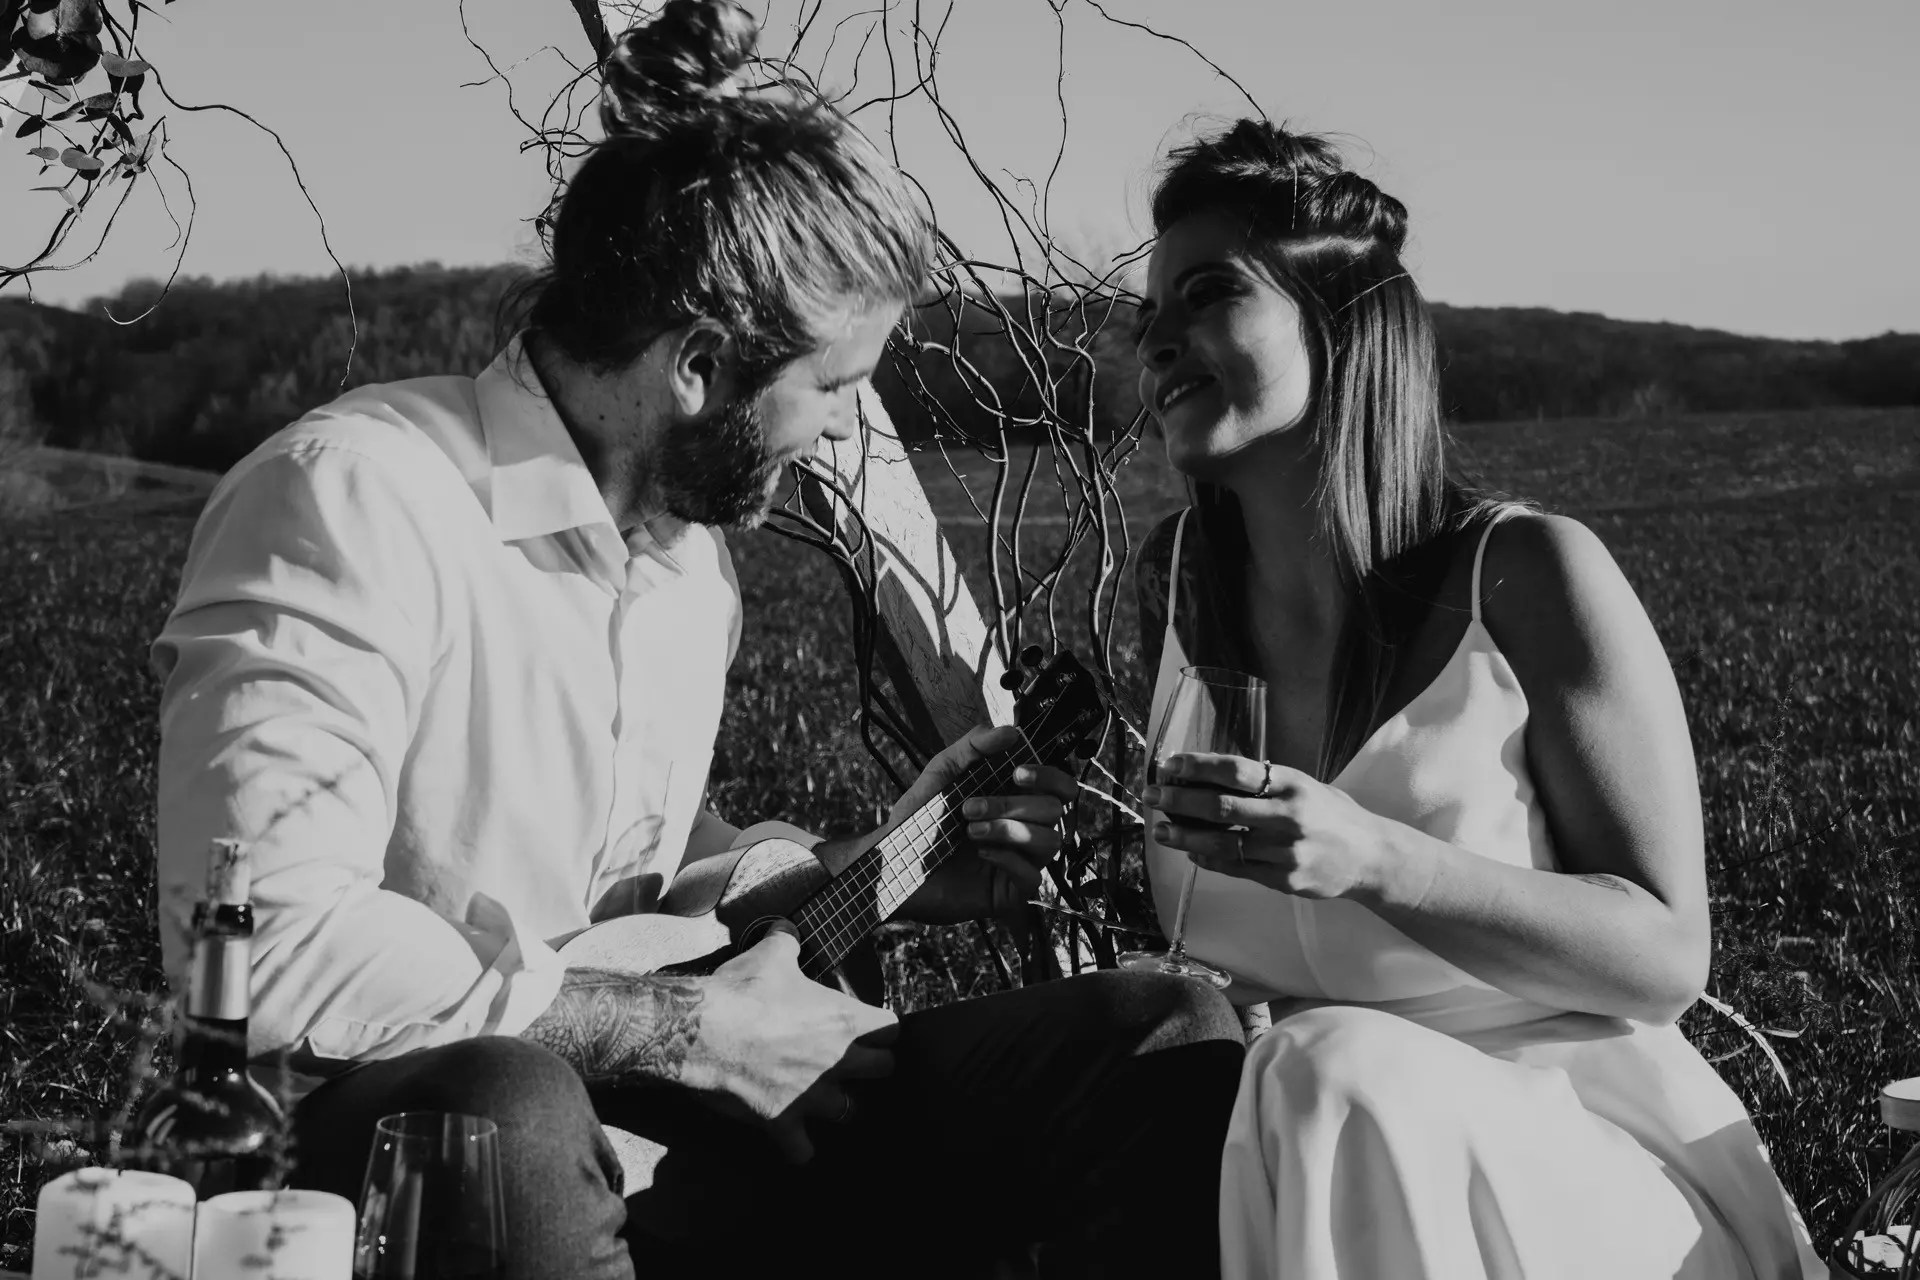 Hochzeitsinspiration Romantisches Picknick meets Skateboard